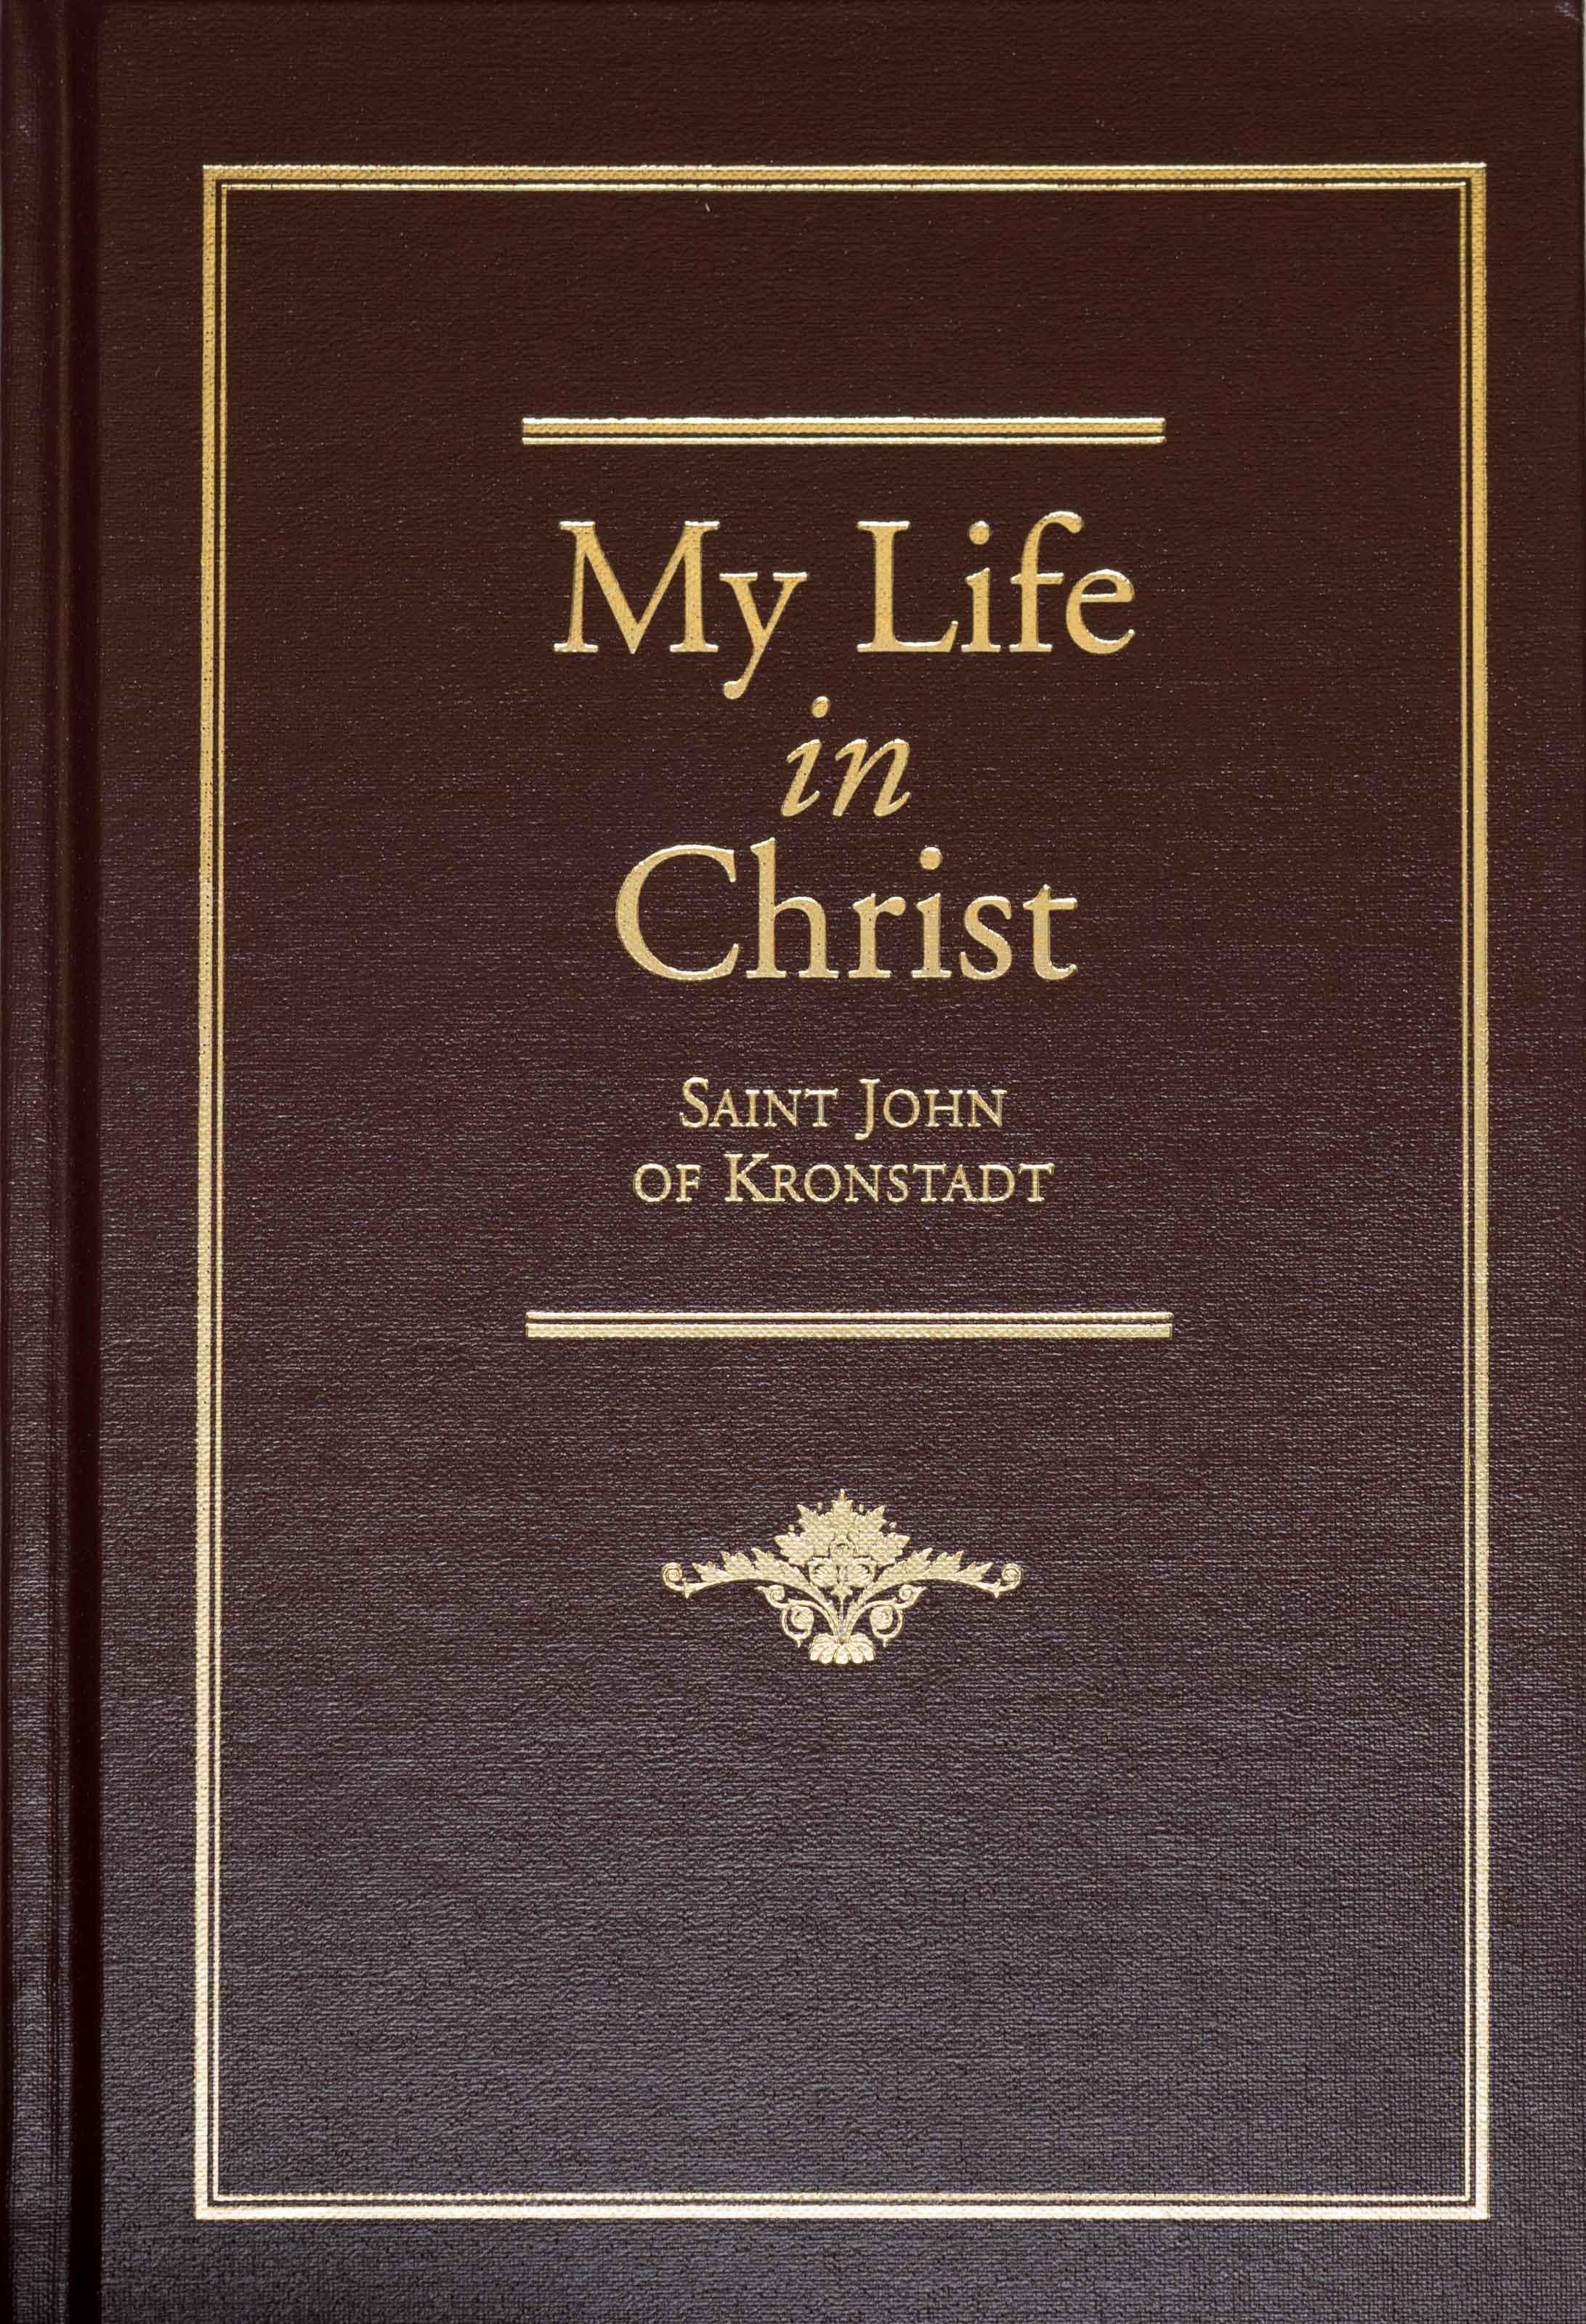 My Life in Christ: Saint John of Kronstadt.